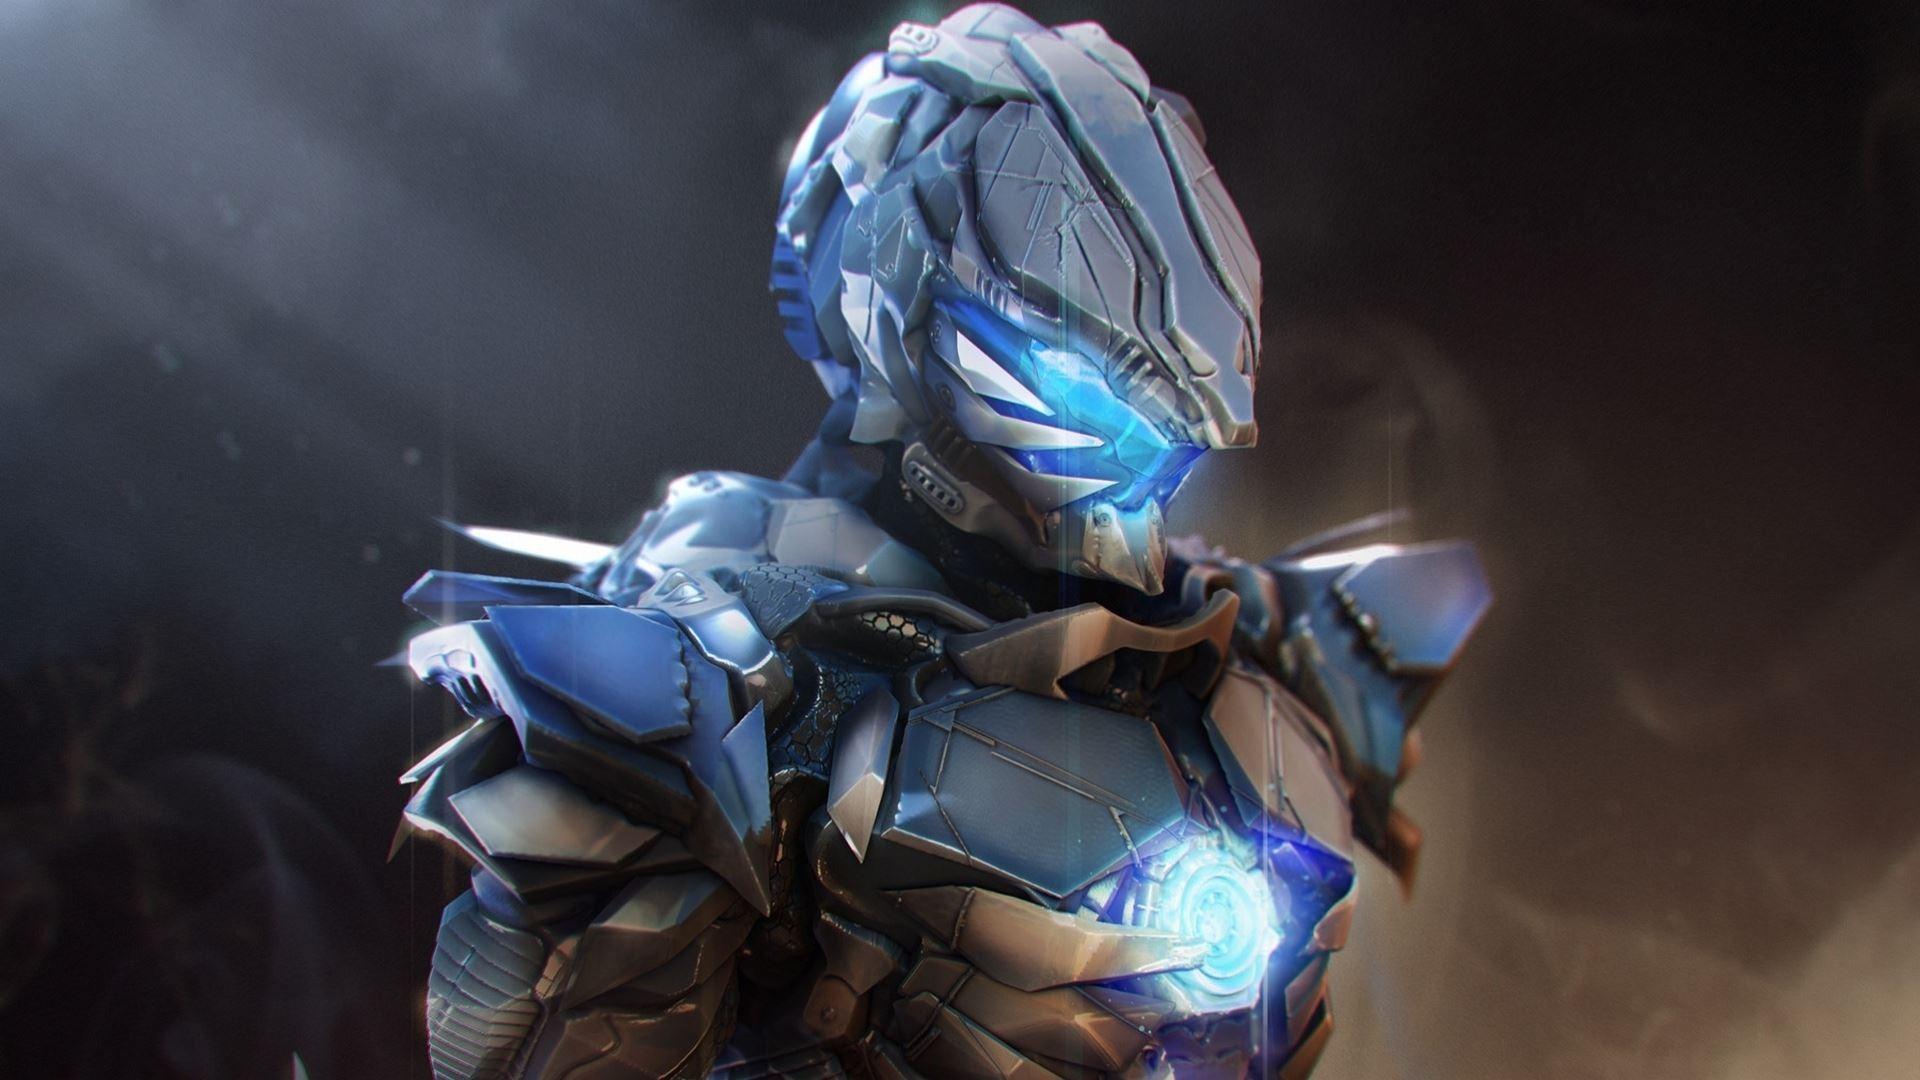 wallpaper anime robot blue warrior toy machine screenshot